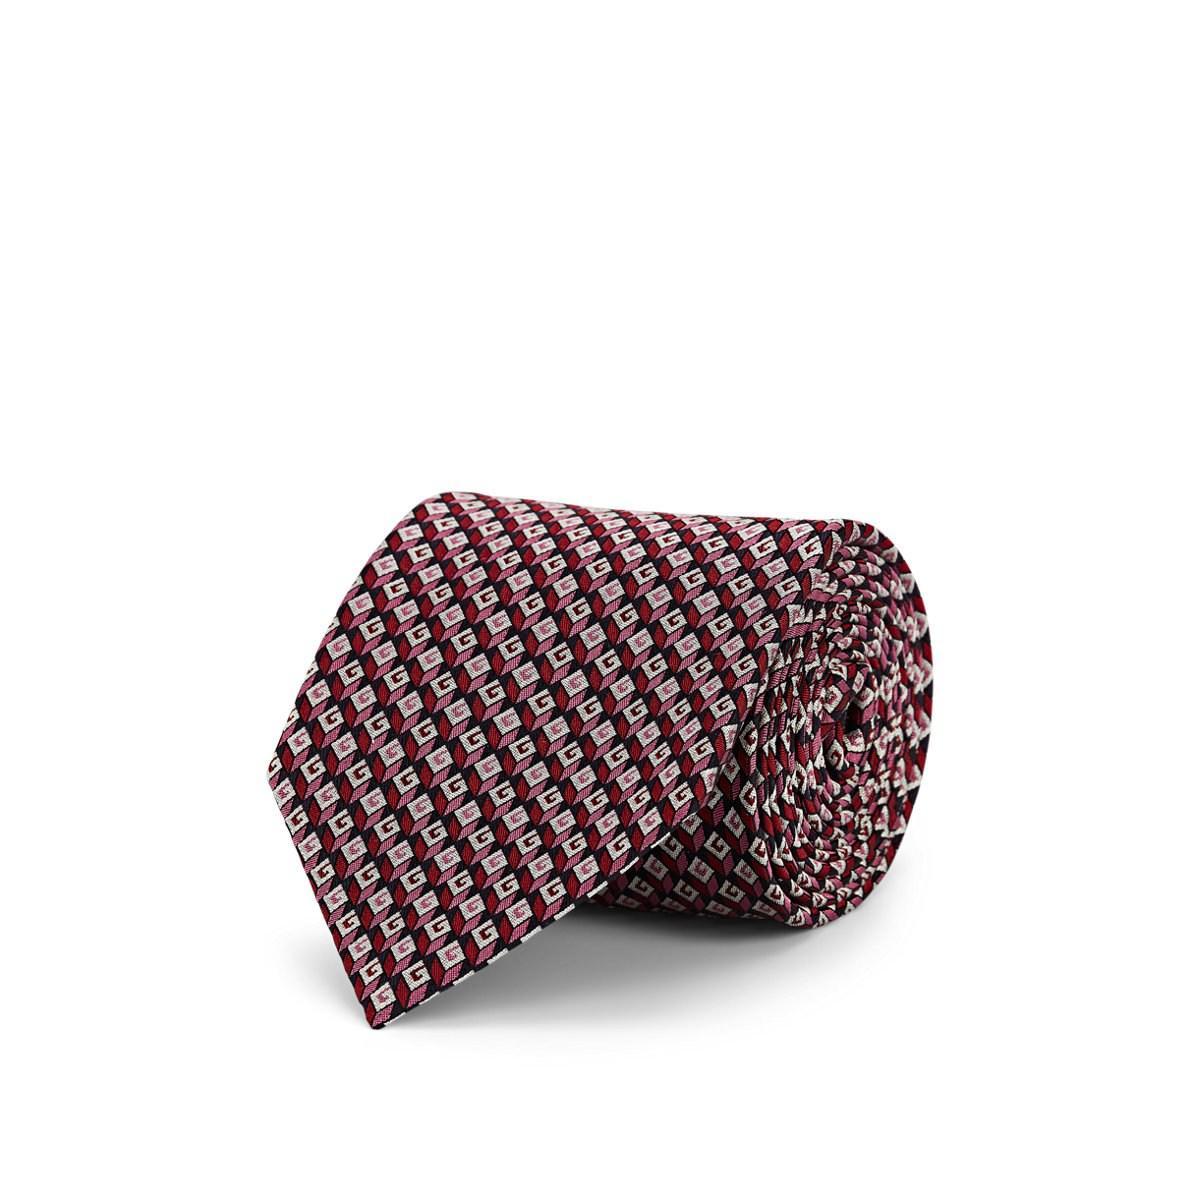 45d02e1ec0e Lyst - Gucci 3d G Silk Jacquard Necktie in Pink for Men